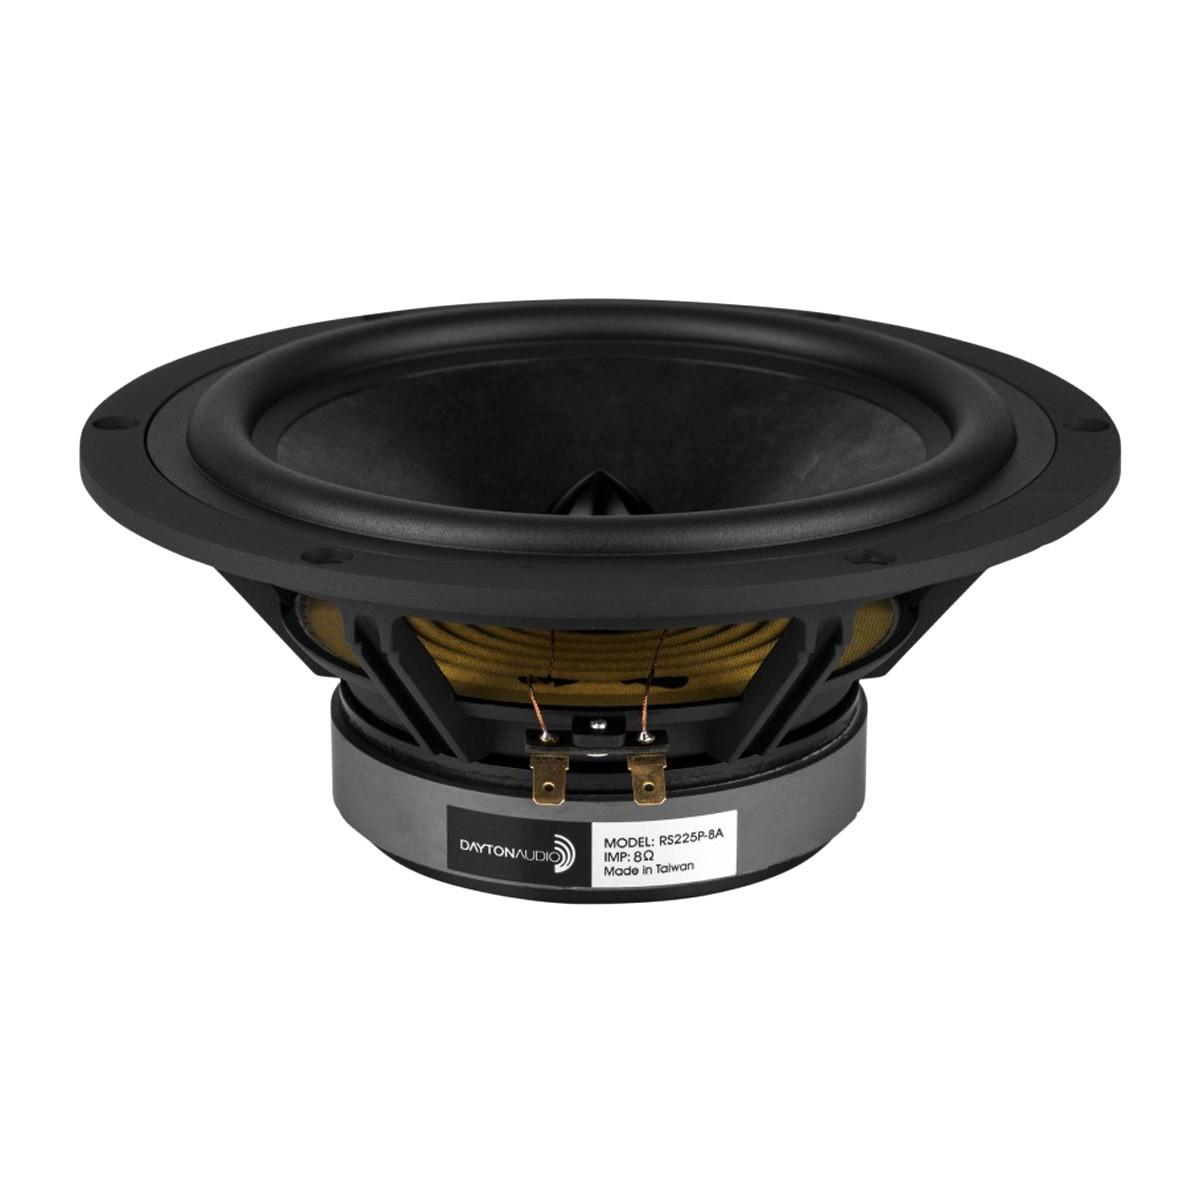 DAYTON AUDIO RS225P-8A Reference Series Speaker Driver Woofer / Midbass 70W 8 Ohm 88dB 30Hz - 7000Hz Ø20.3cm